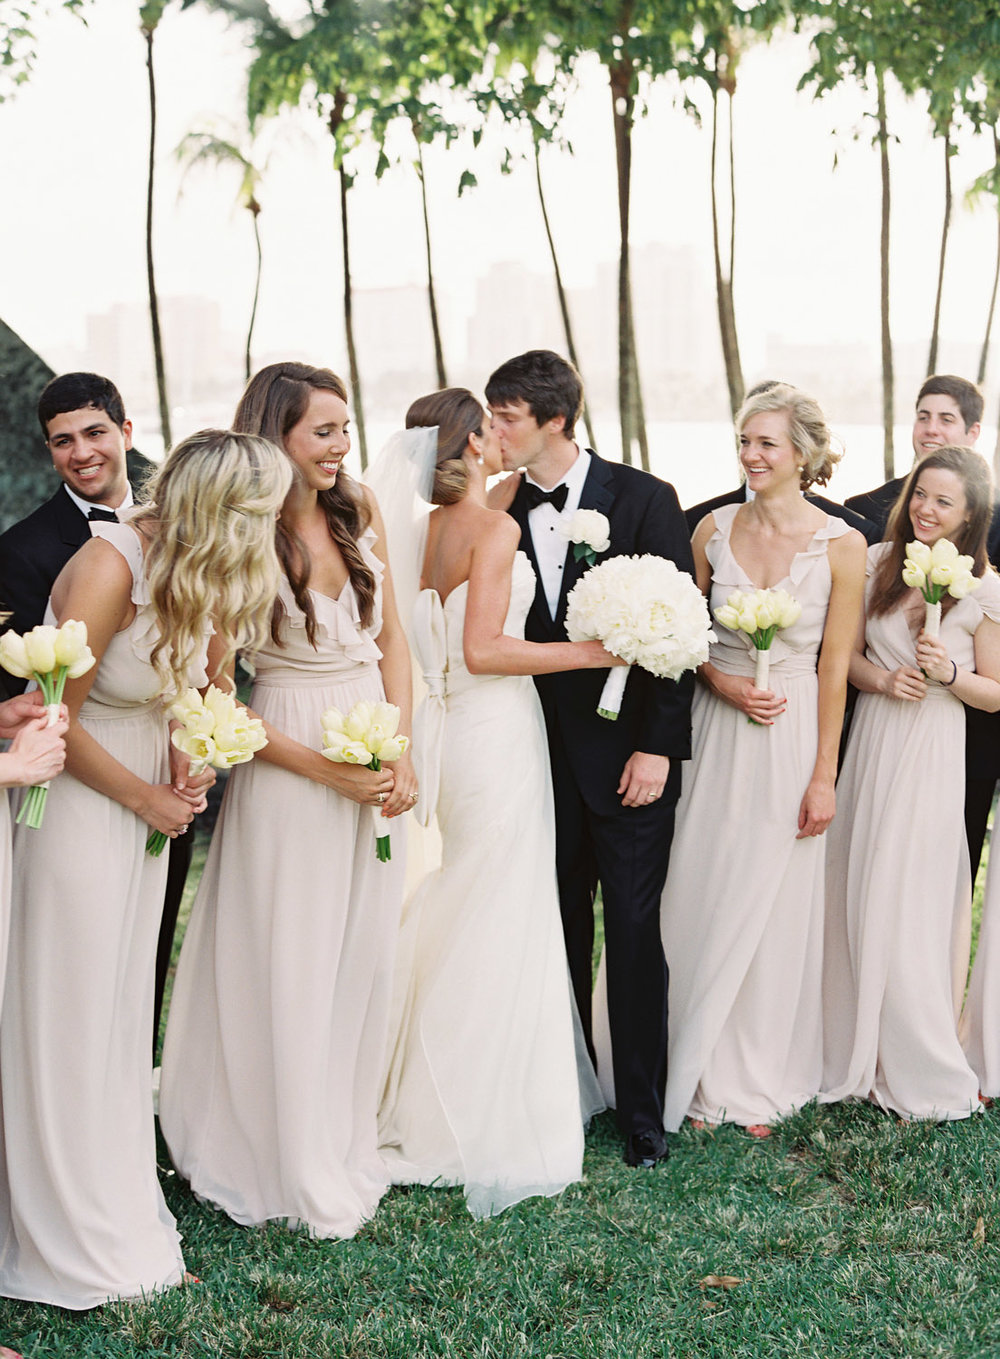 Caroline-Rascoe-Wedding-Film-260.jpg